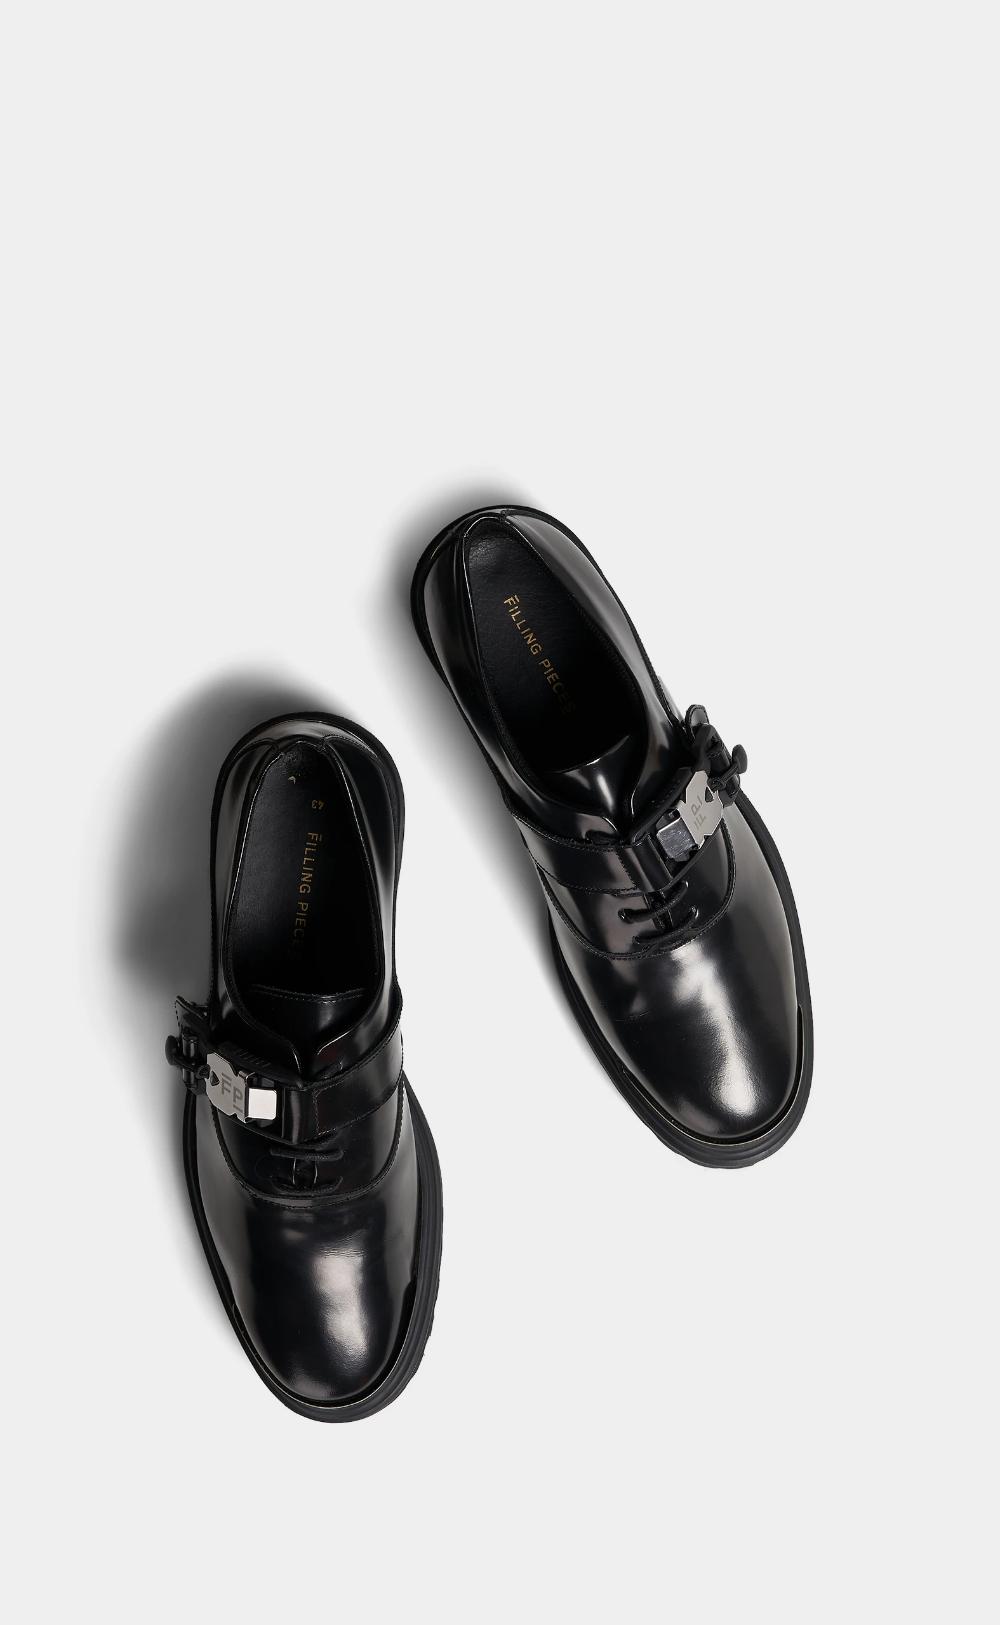 Waspy Dress Up Black Formal Shoes Dress Shoes Men Dress Shoes [ 1625 x 1000 Pixel ]